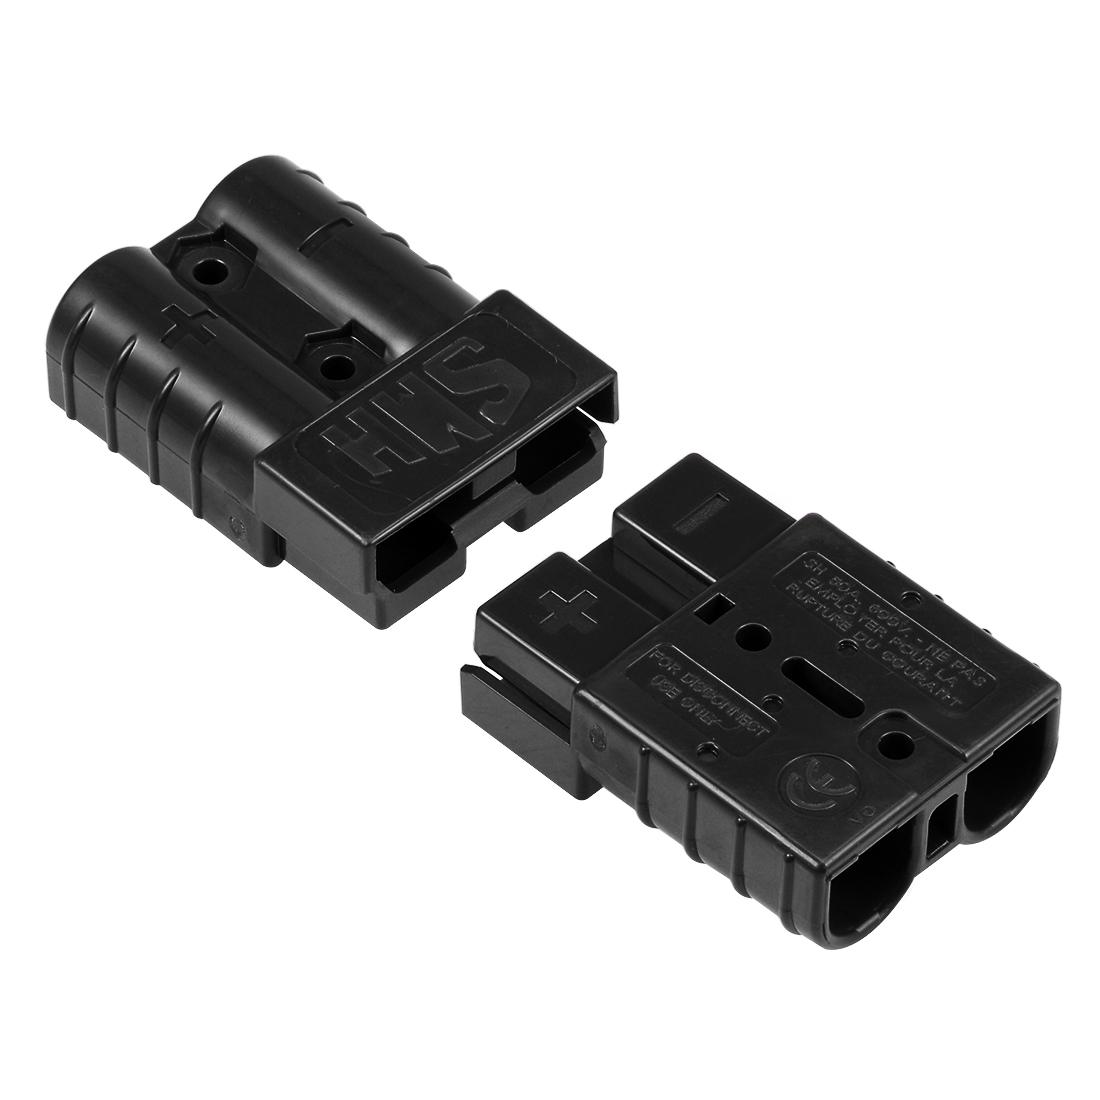 6 Gauge Battery Quick Connect Disconnect 50A Wire Connector, Black, 2pcs